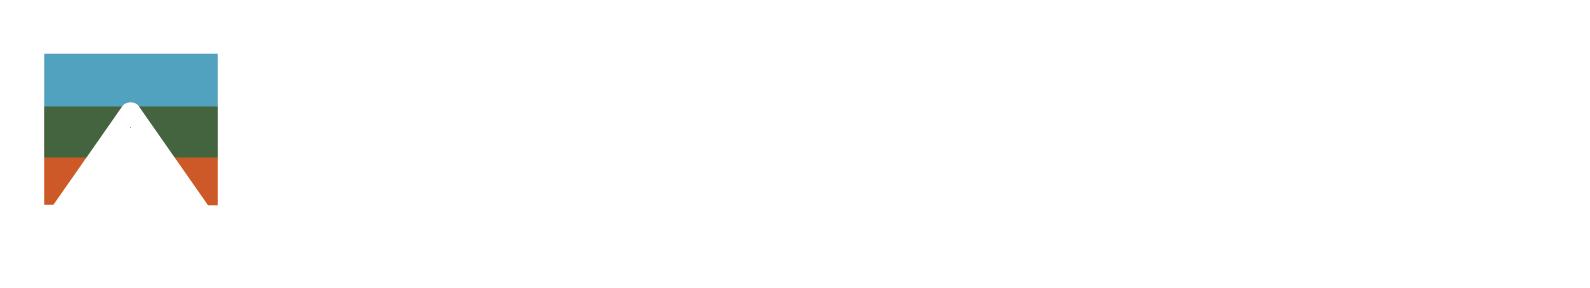 brandcamp logo